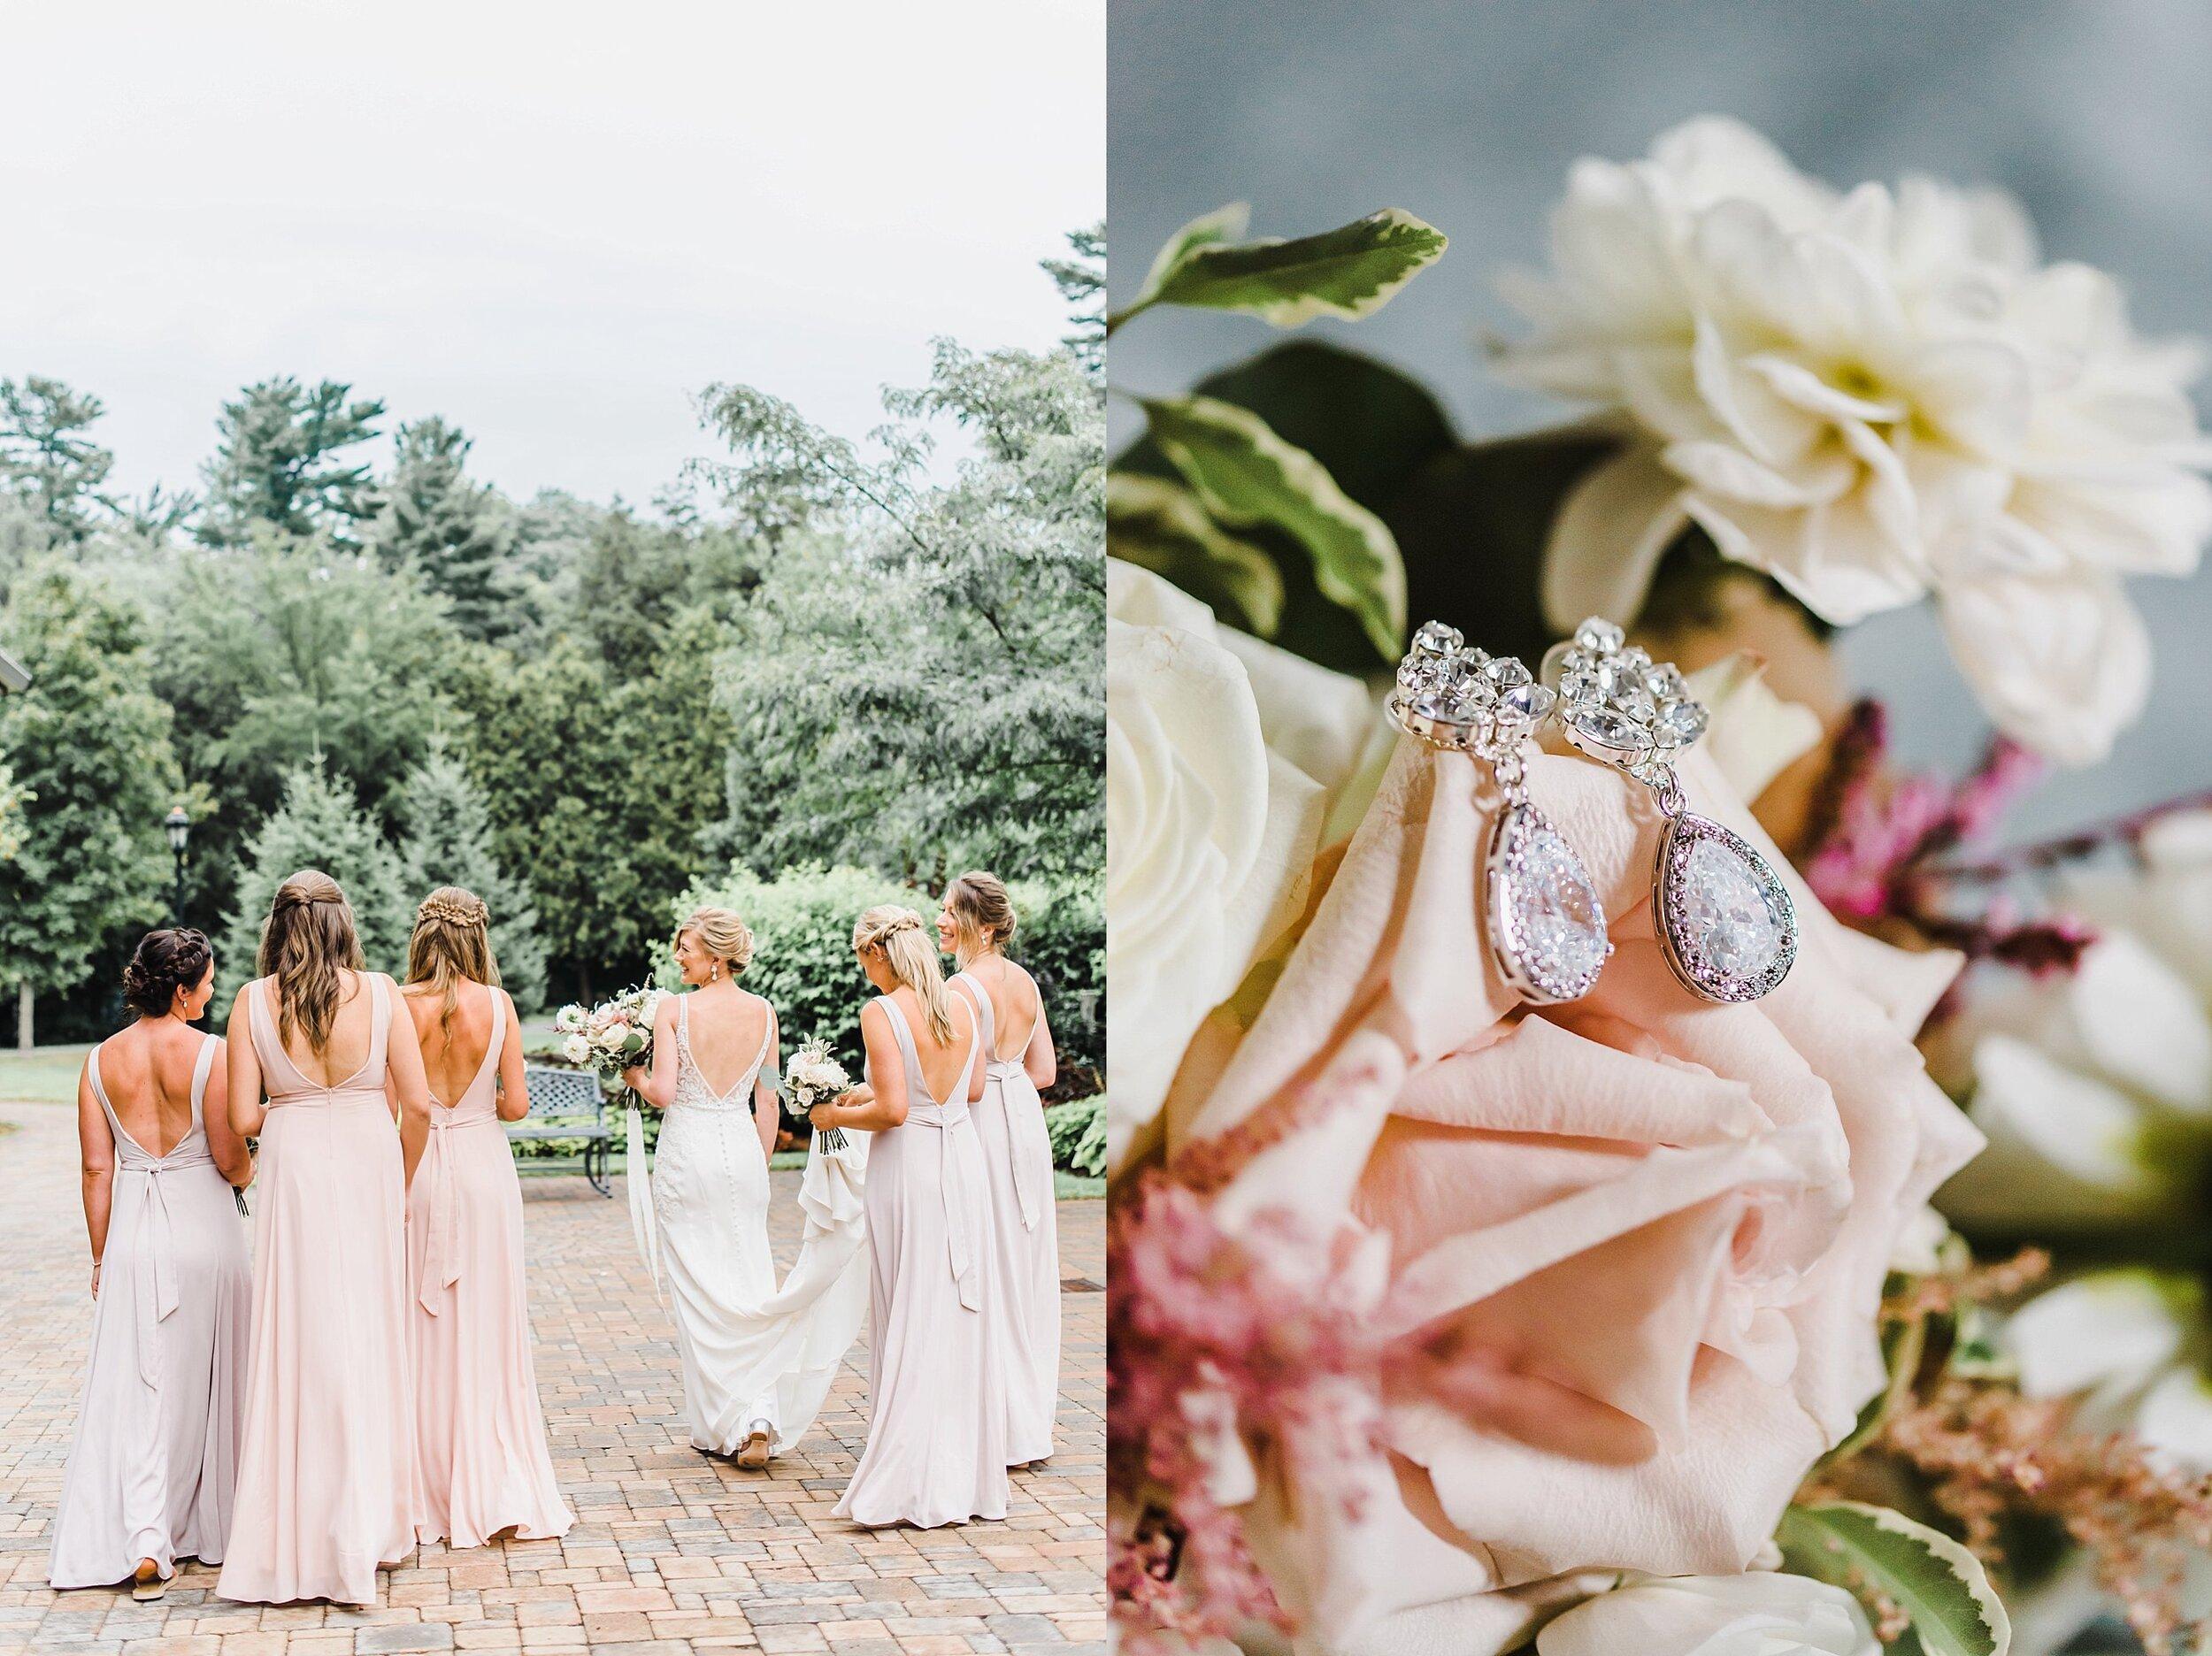 light airy fine art ottawa wedding photographer | Ali and Batoul Photography | Fairmont Le Chateau Montebello8.jpg